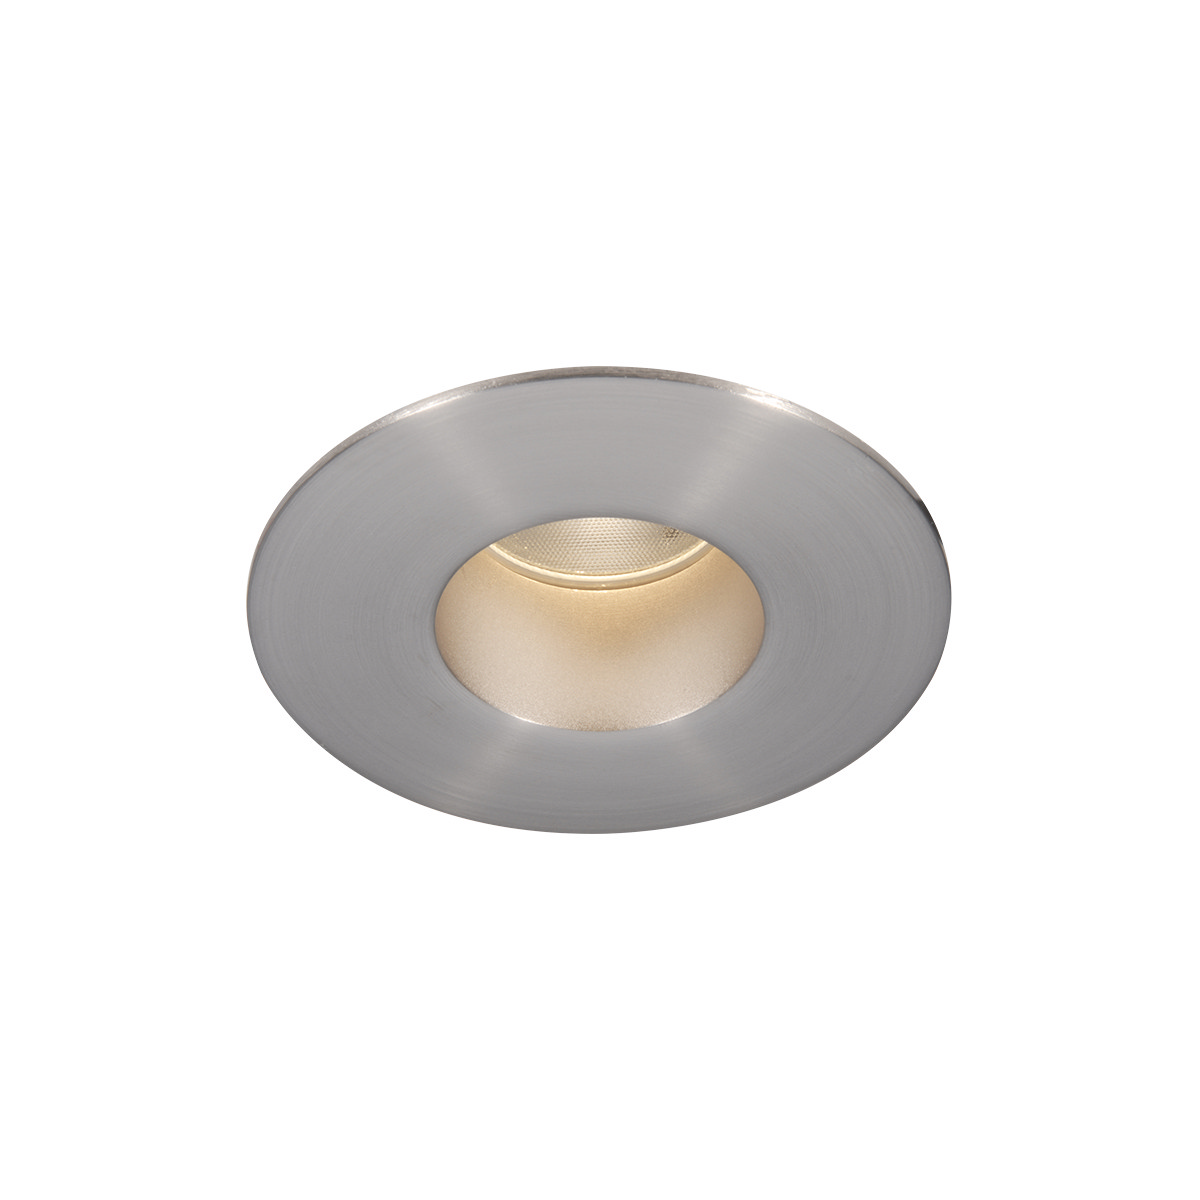 W.A.C. Lighting HR2LEDT209PN835BN LED Shower Trim